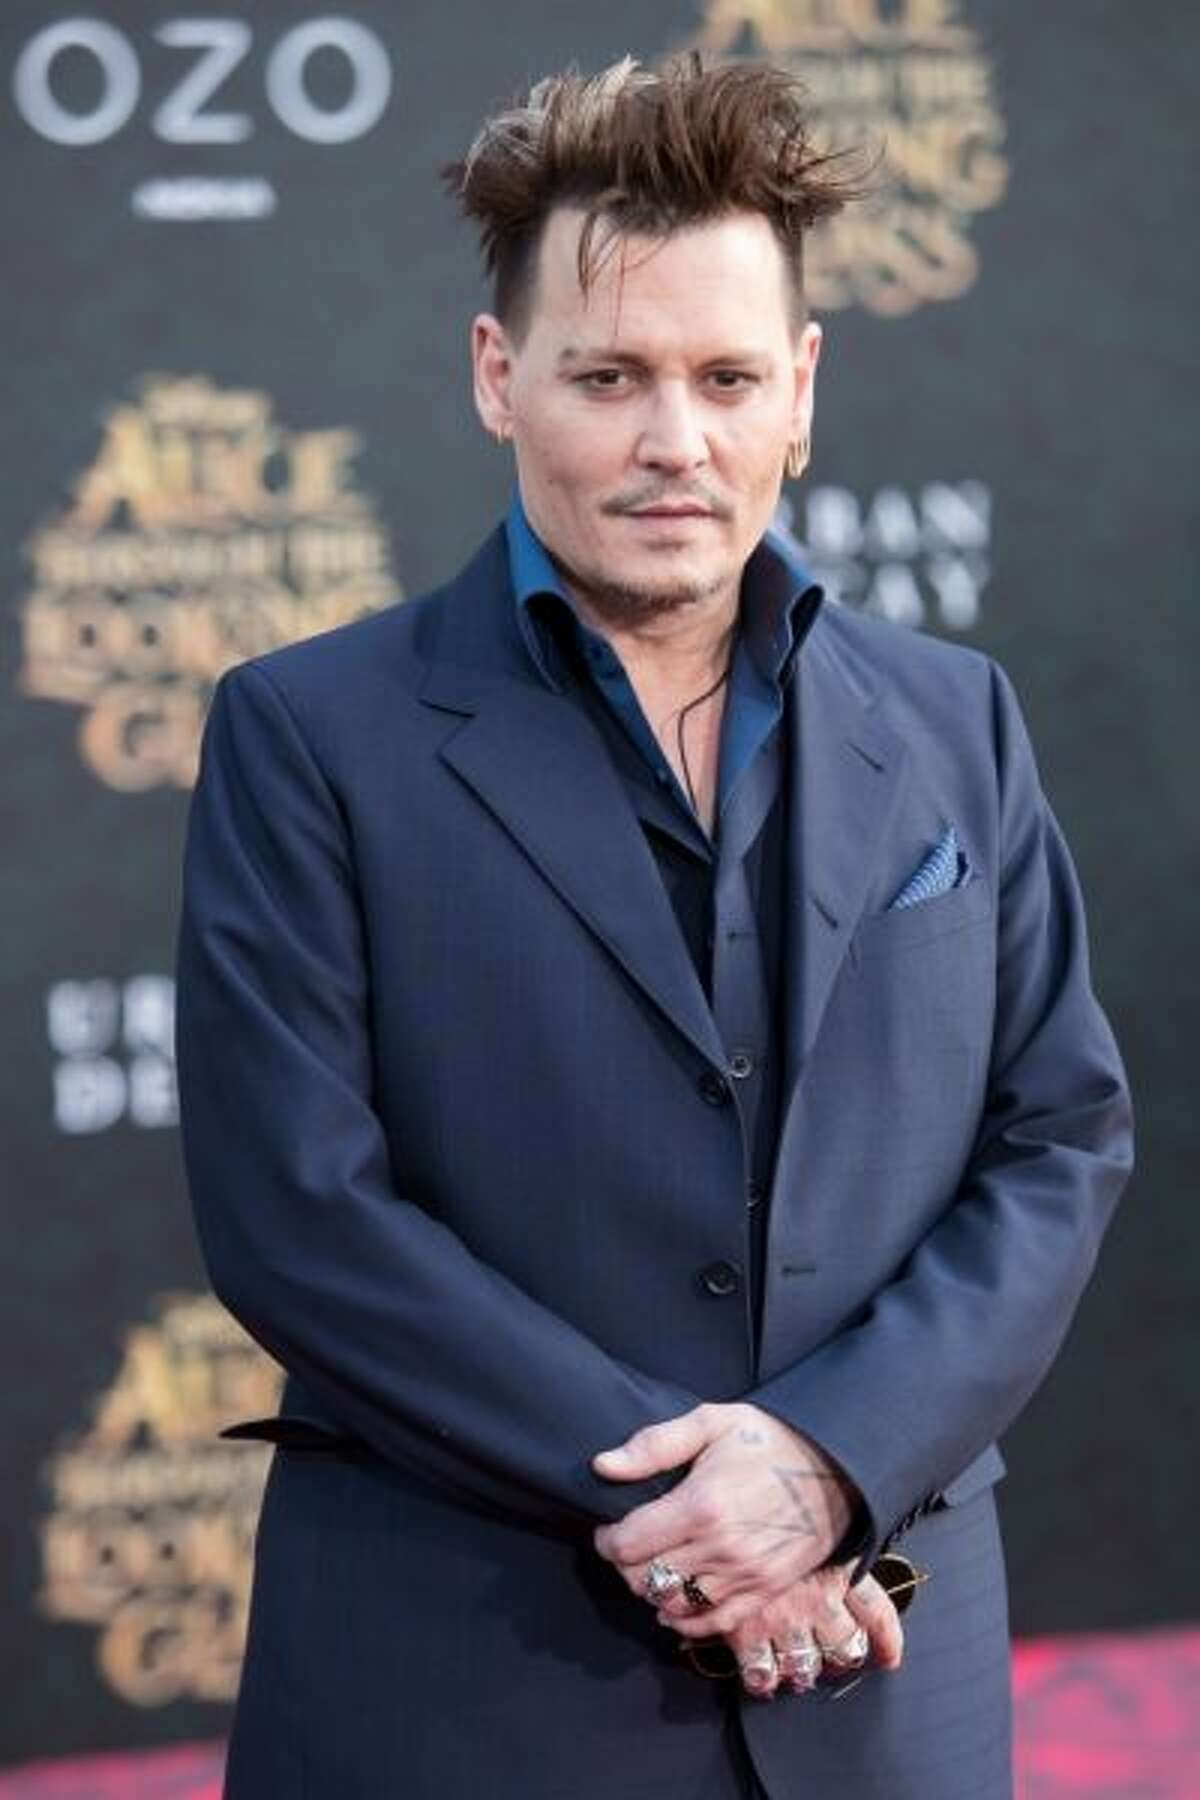 CLOWNS: According to Zimbio, Johnny Depp has a fear of clowns.